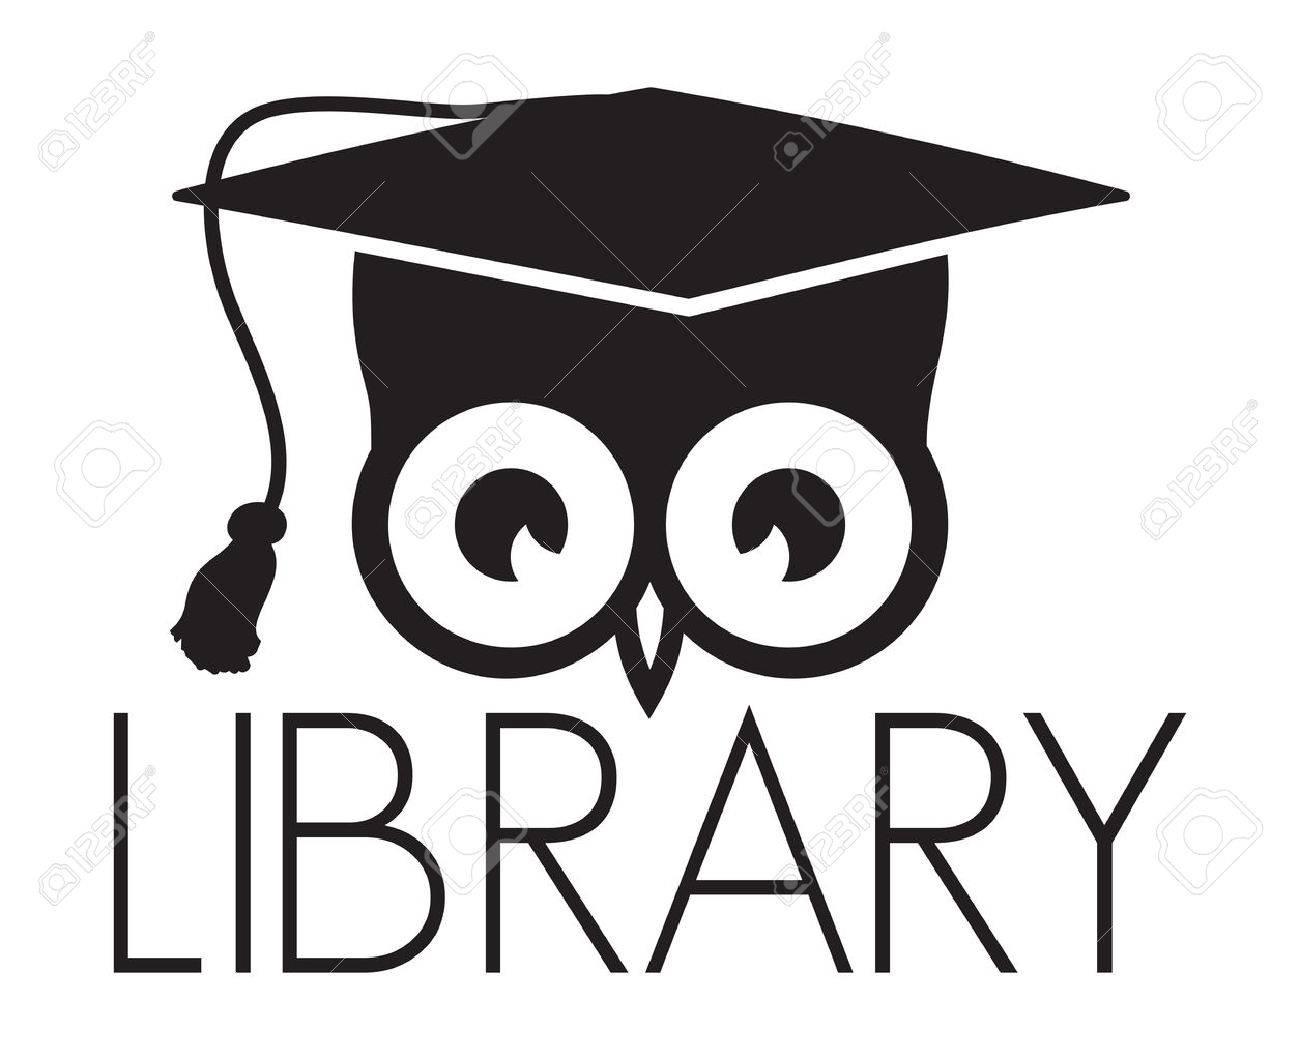 library icon Stock Vector - 24355279